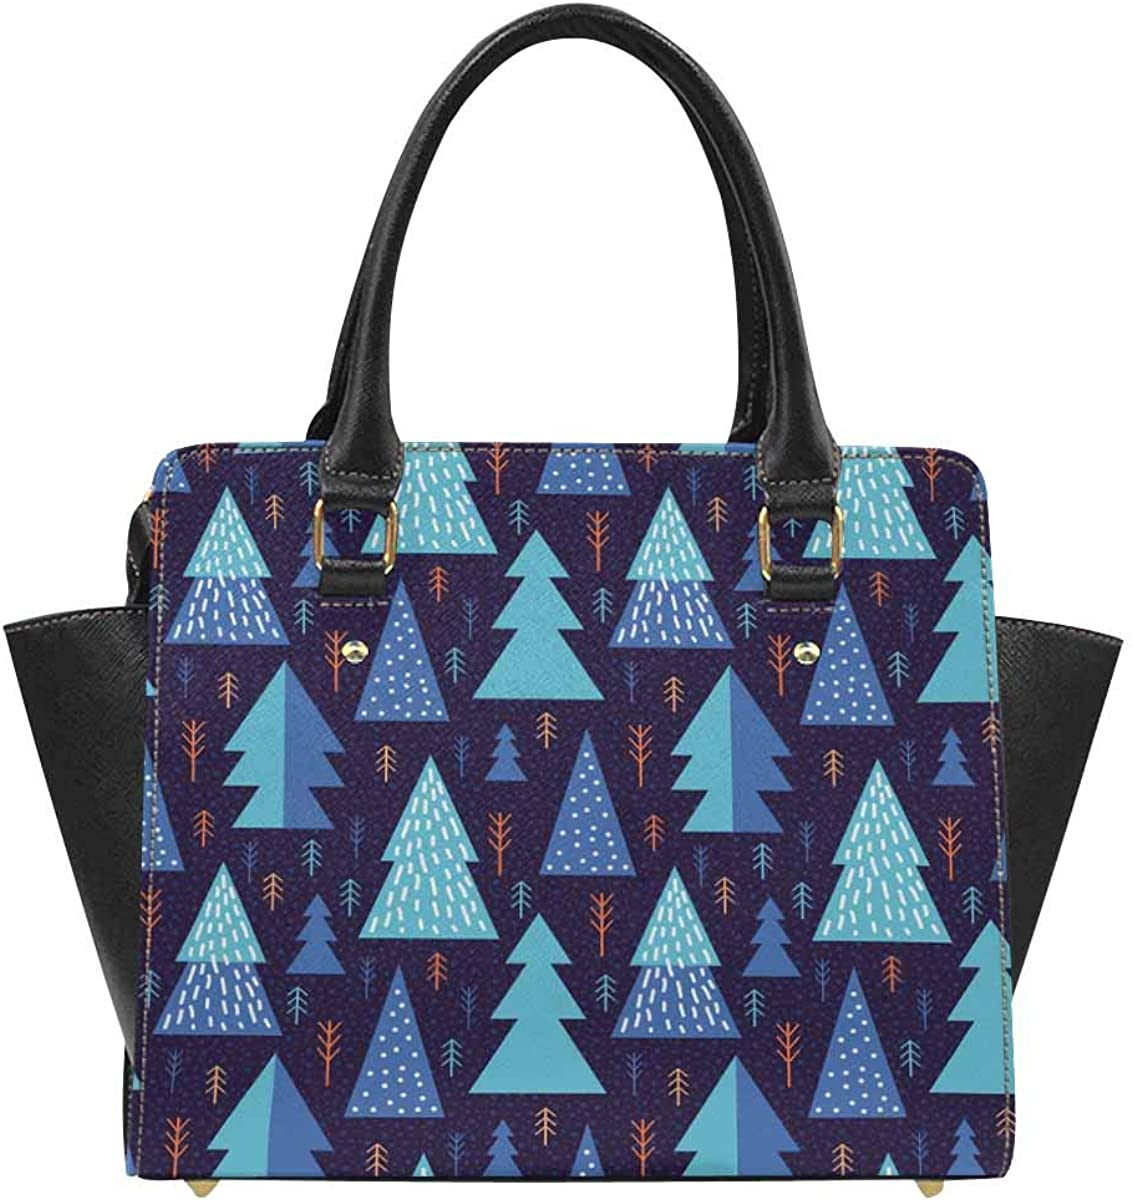 INTERESTPRINT Geometric Forest Classic Top Handle Shoulder Handbag